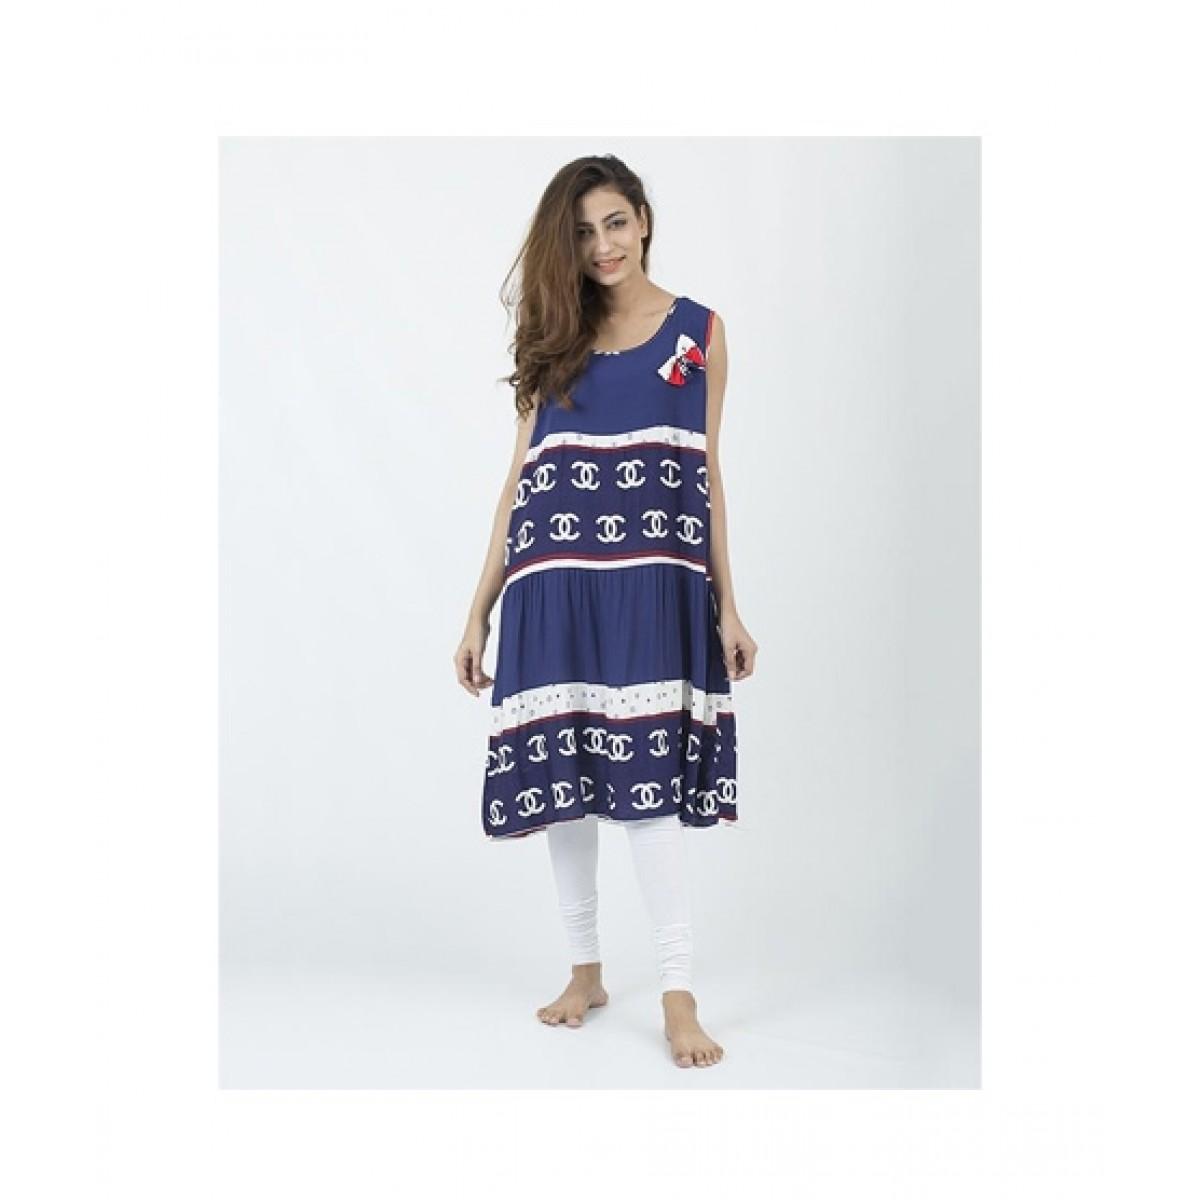 Asaan Buy Cotton Floral Print Sleeveless Night T-Shirt For Women - Dark Blue